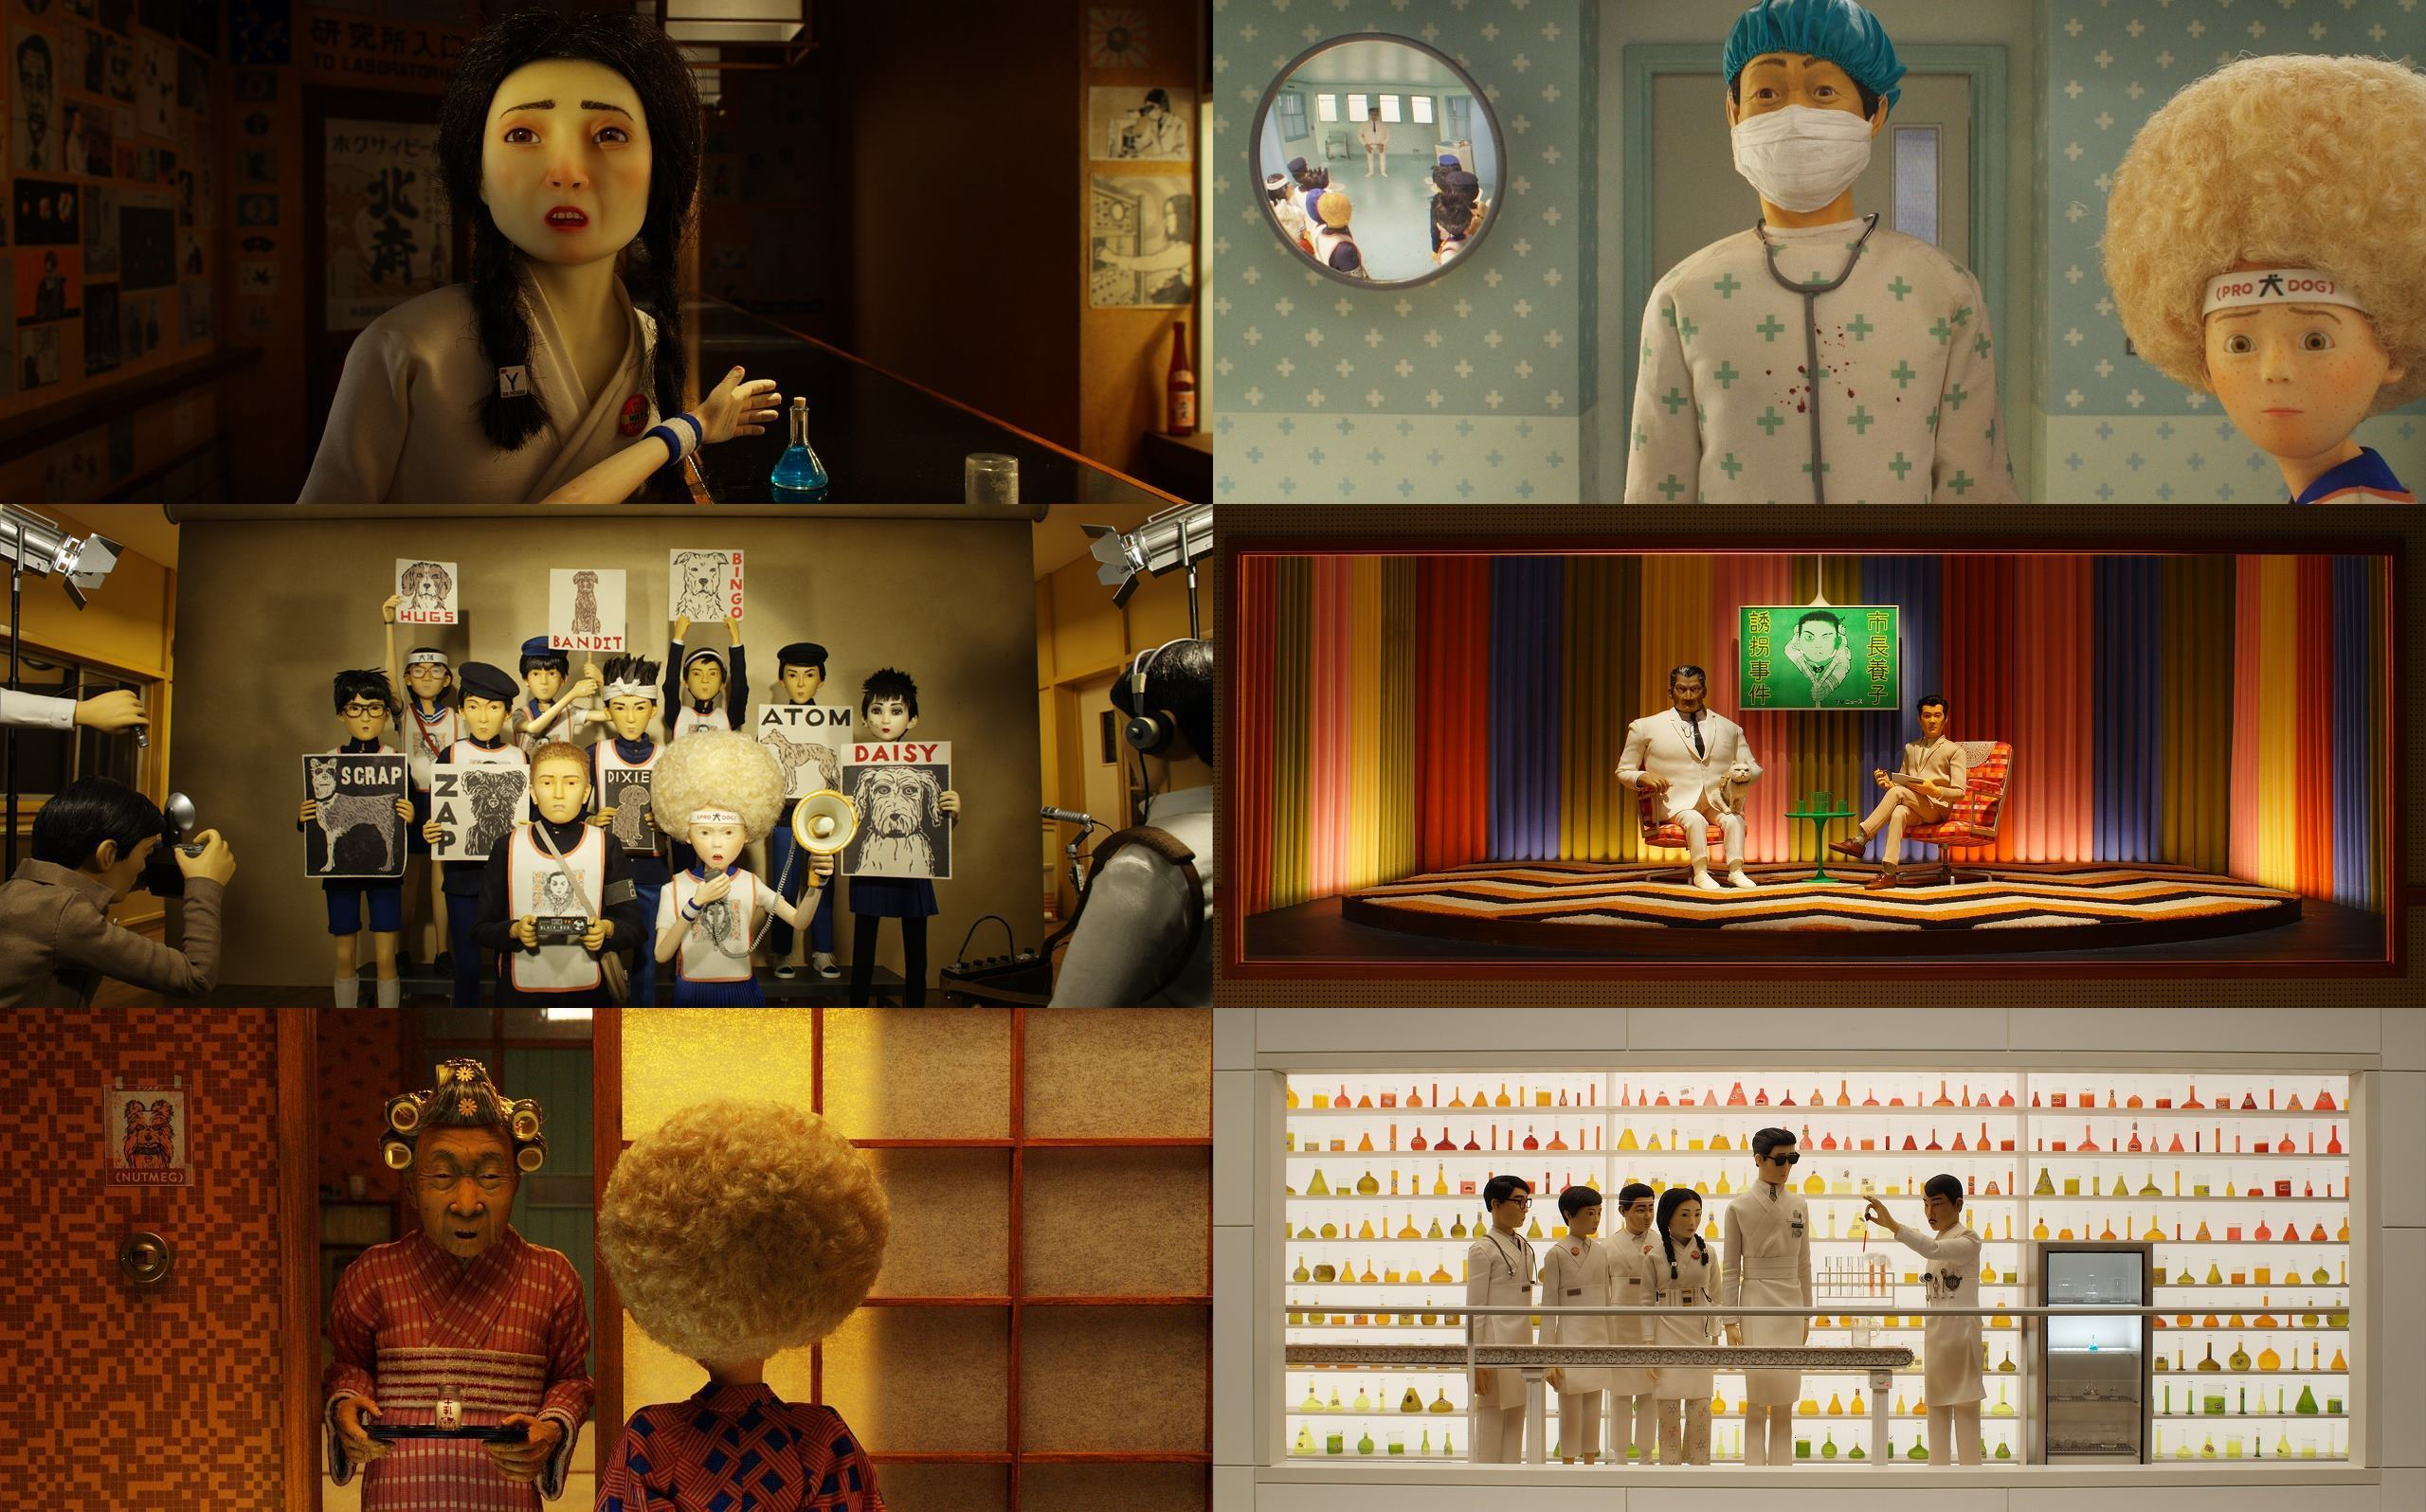 (C)2018 Twentieth Century Fox Film Corporation